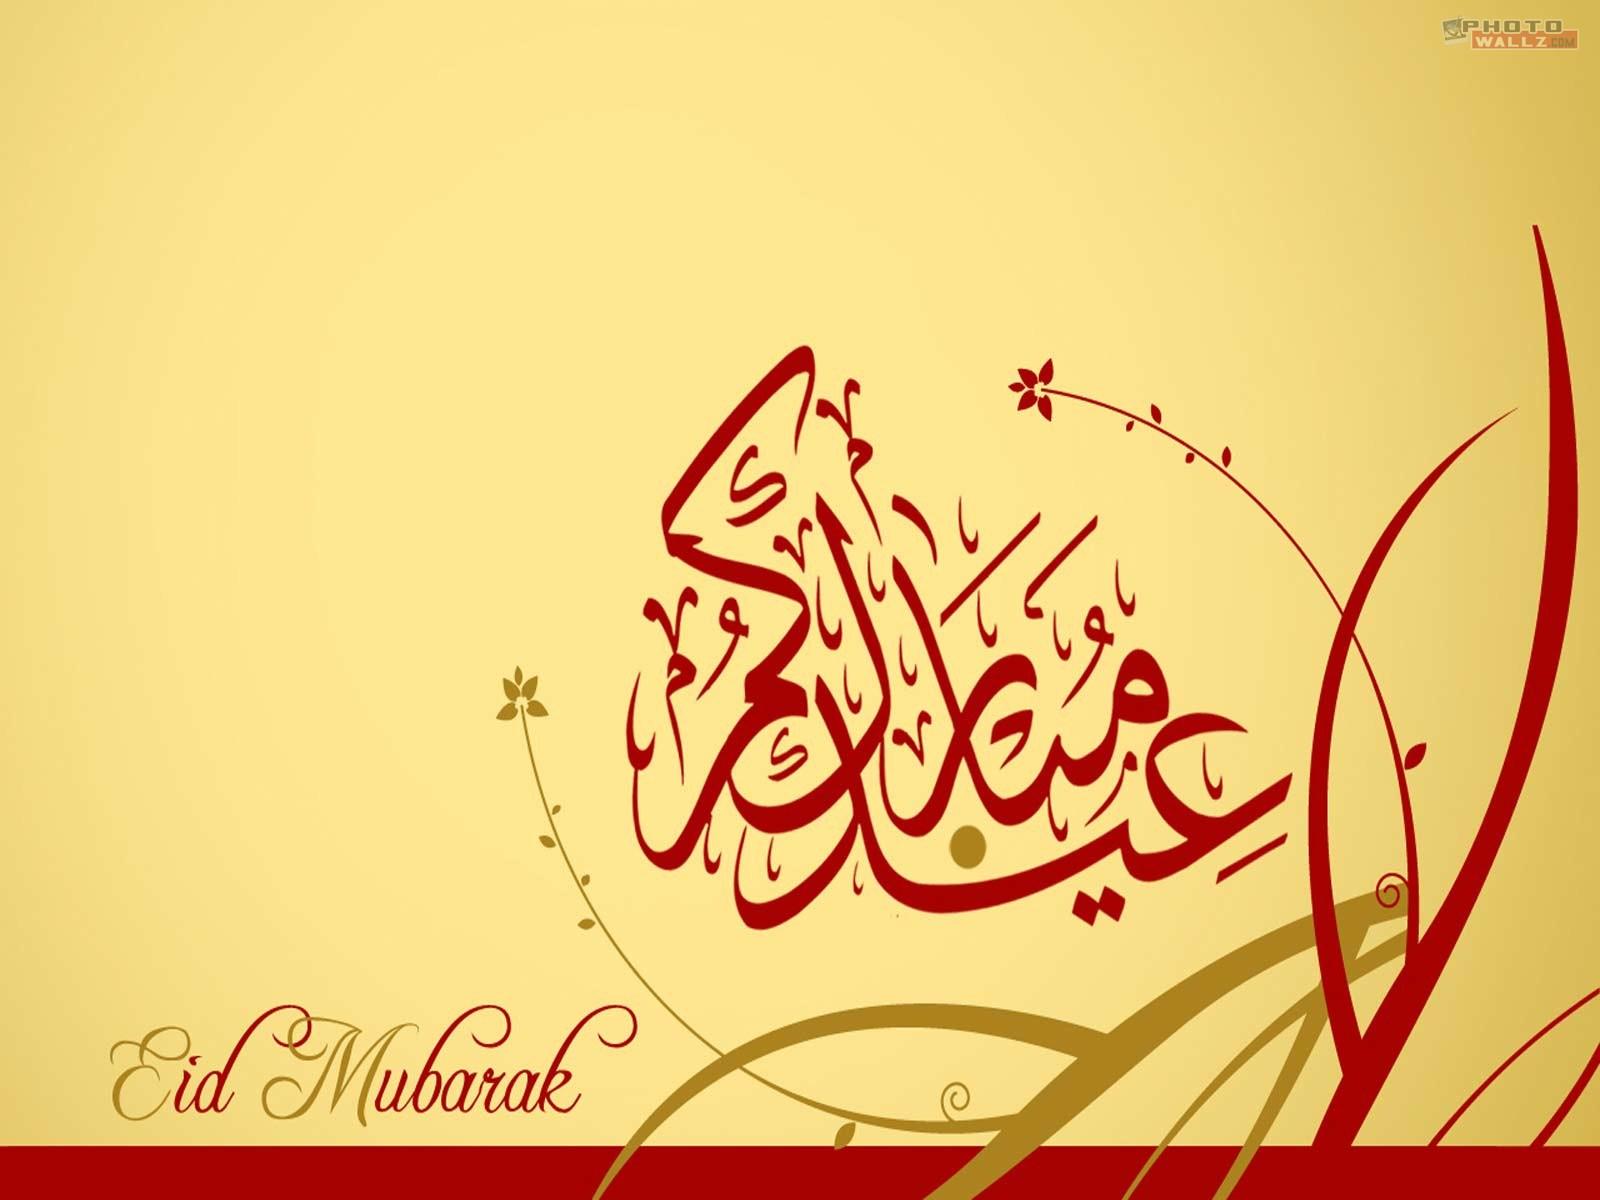 eid mubarak - photo #32